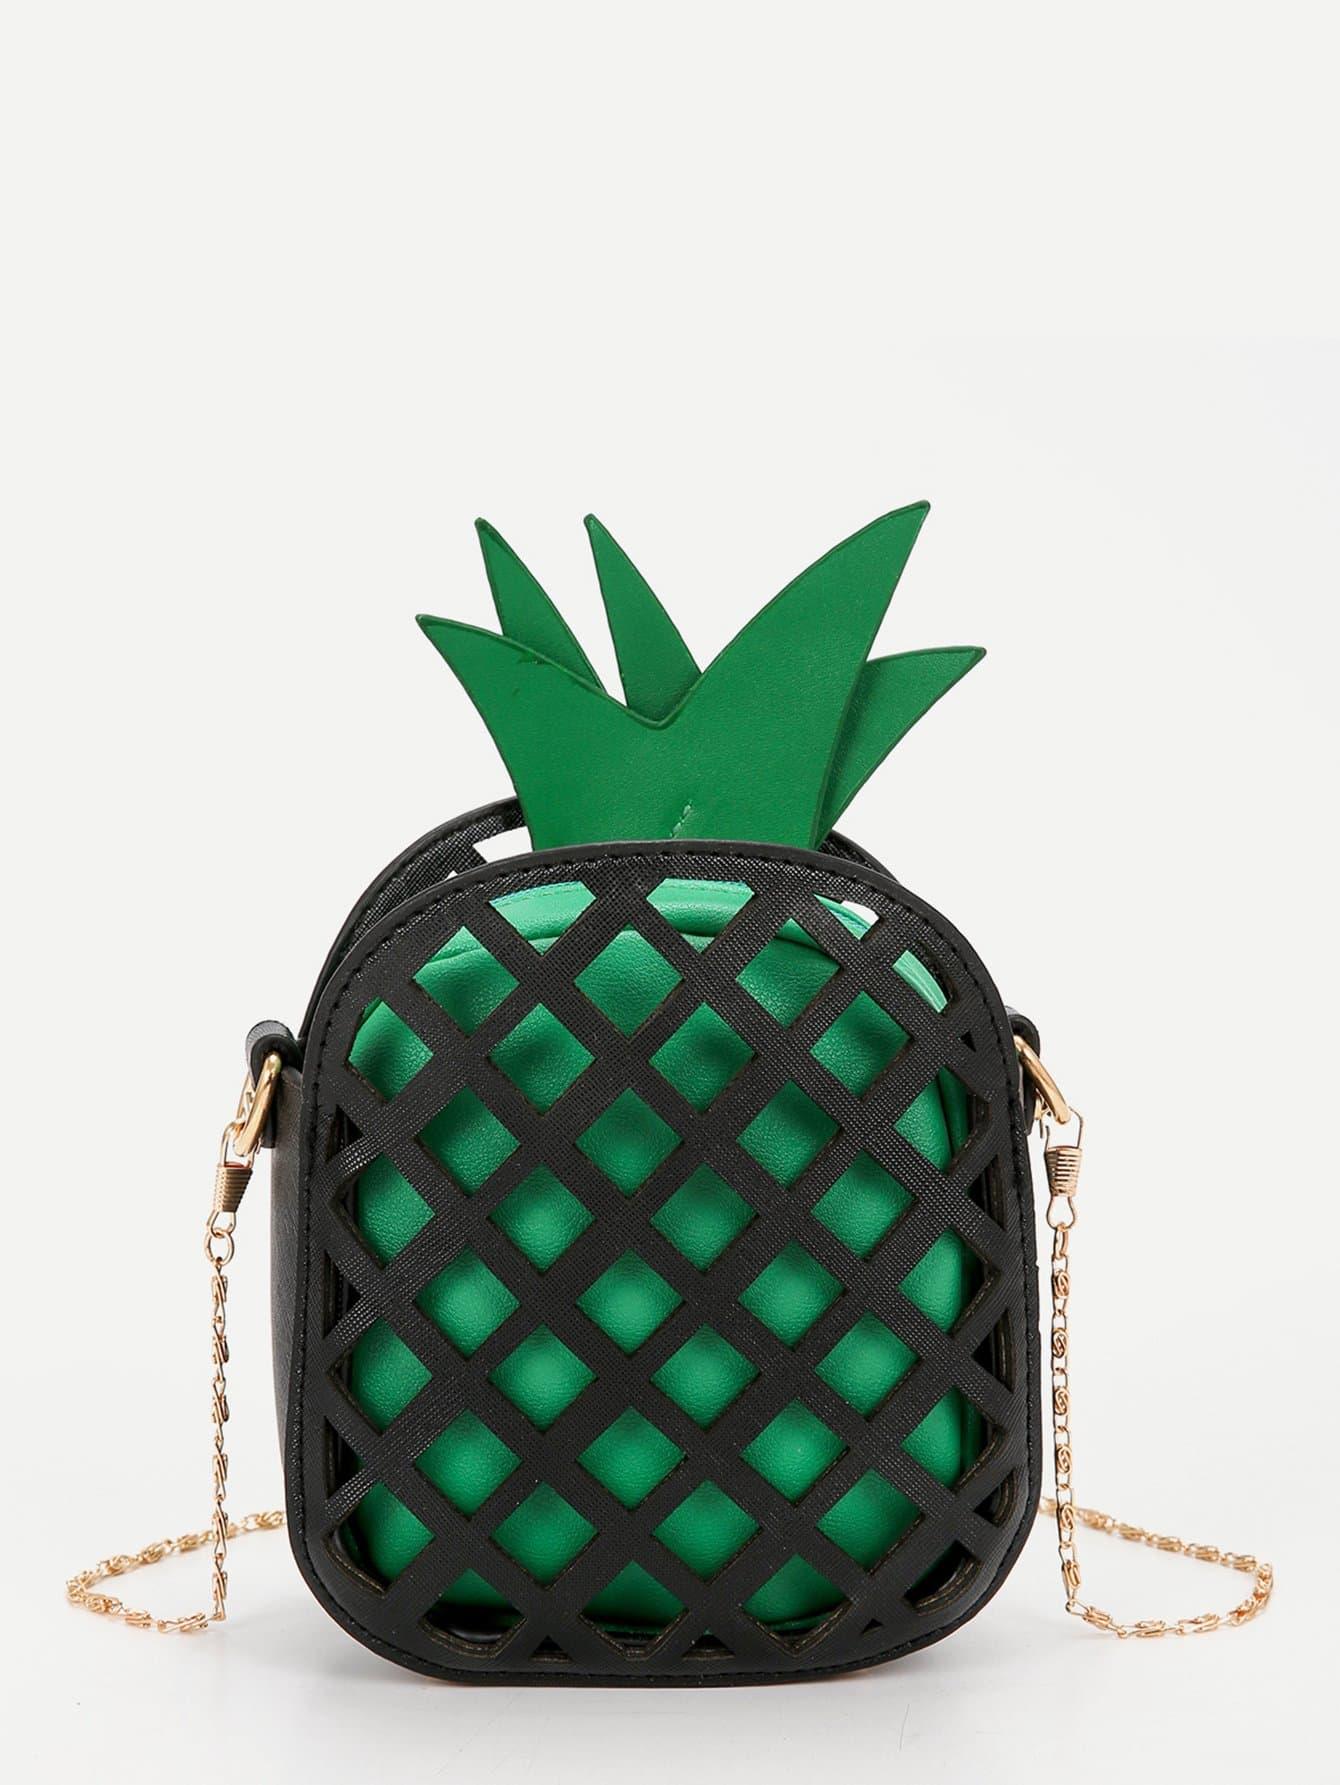 Pineapple Shaped PU Chain Crossbody Bag pineapple shaped pu bag